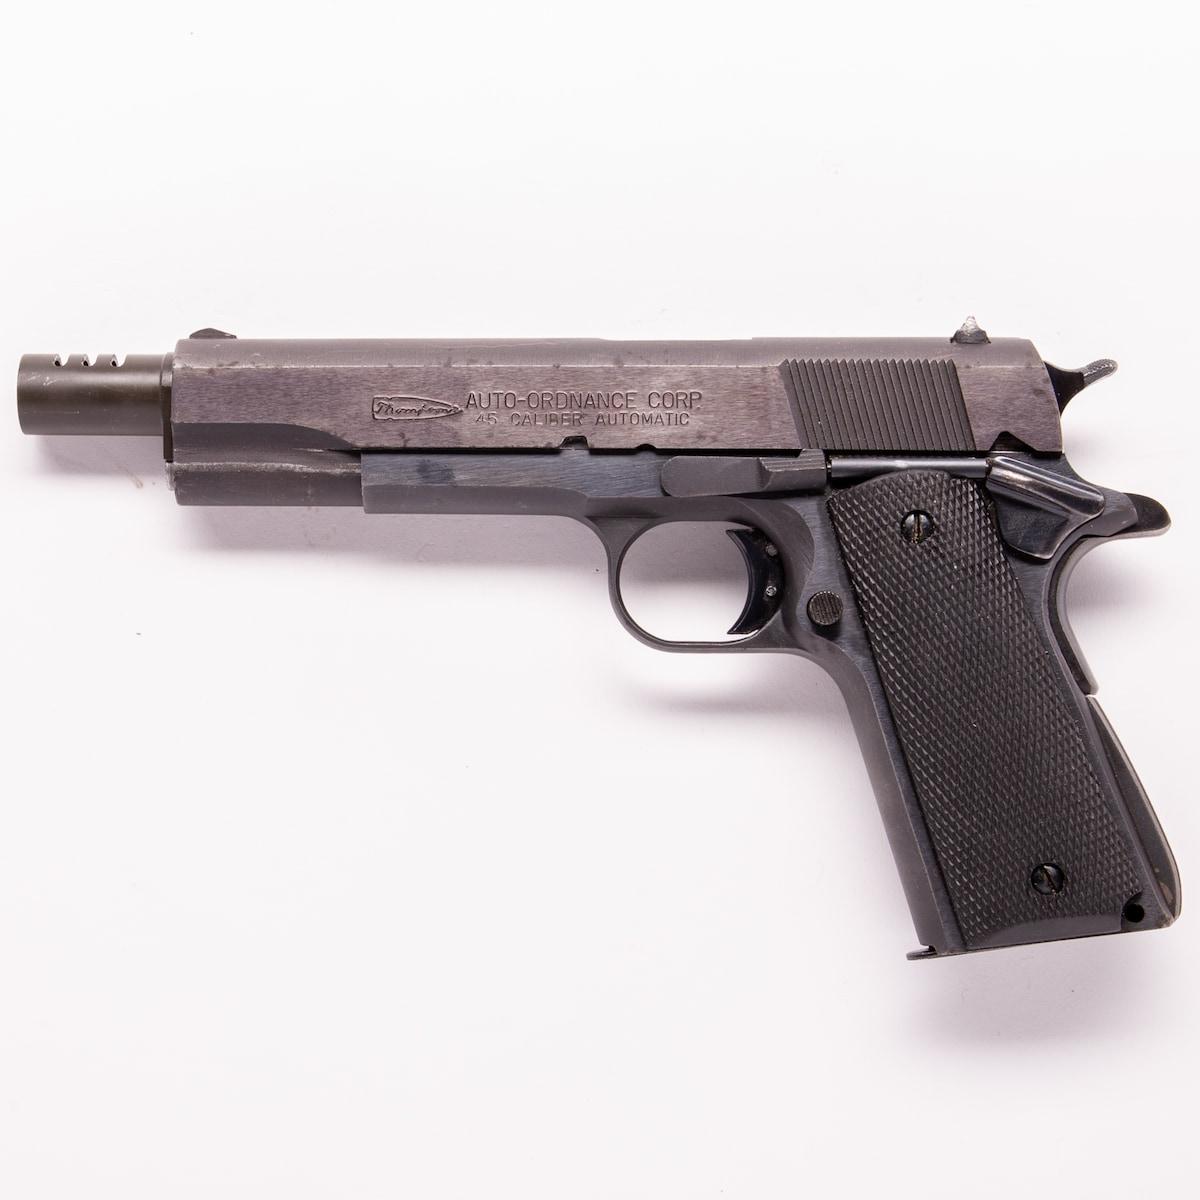 AUTO-ORDNANCE 1911